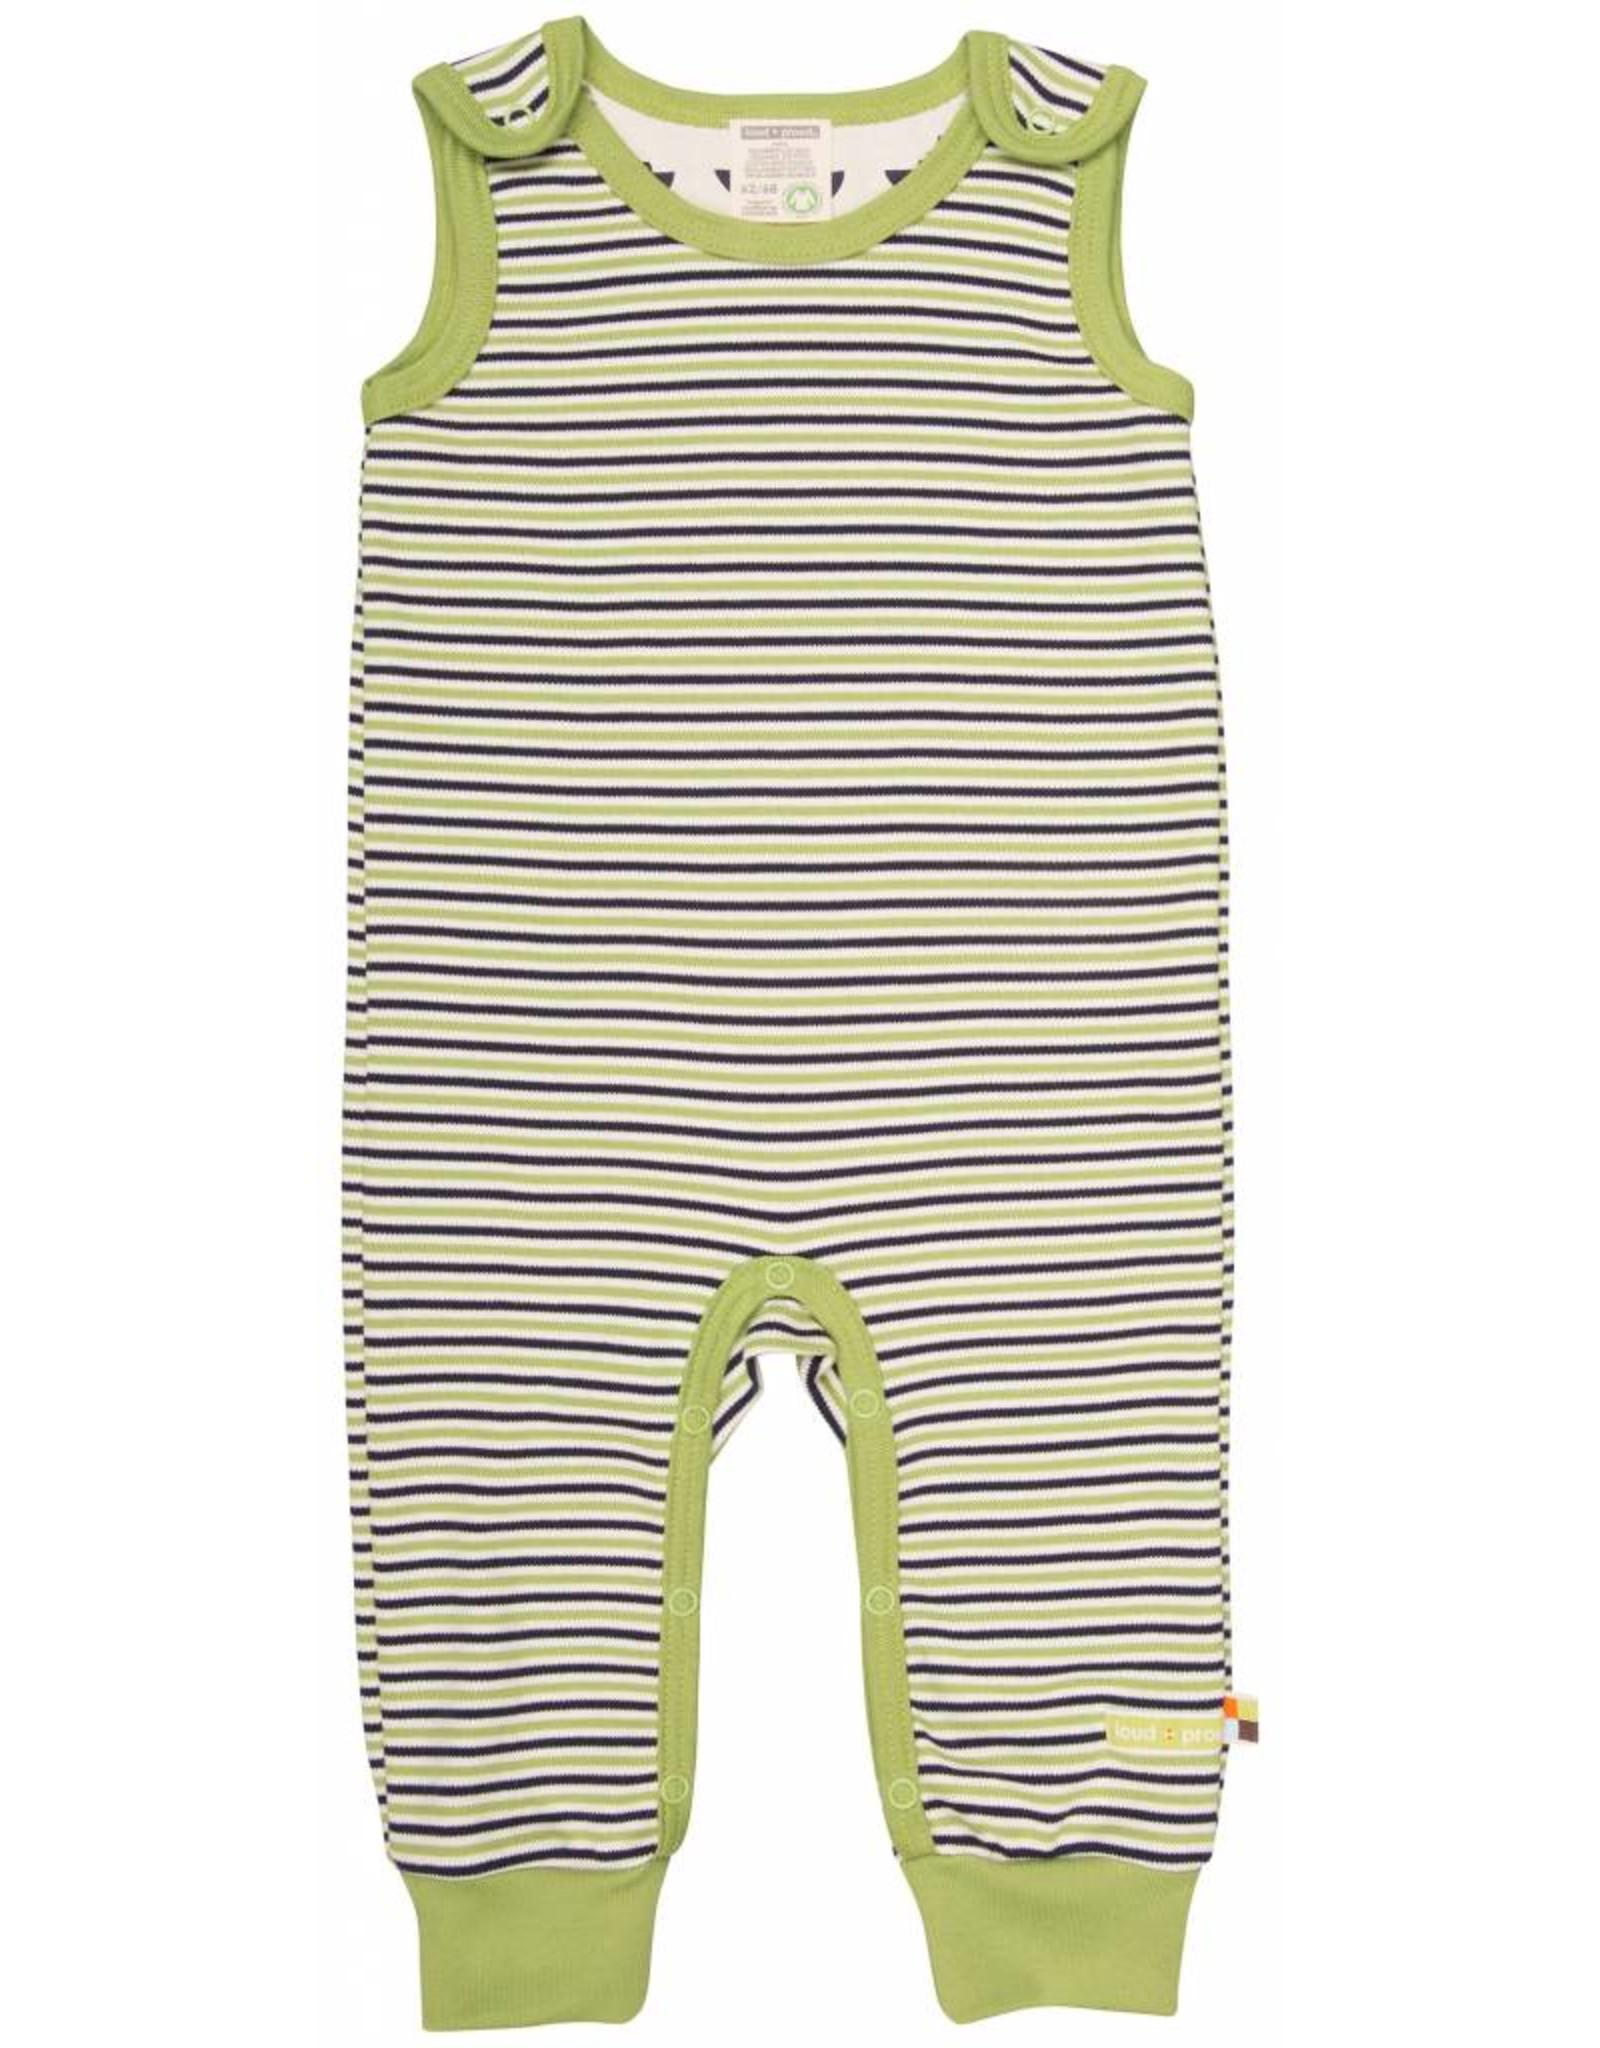 loud+proud Baby jumpsuit - groen gestreept